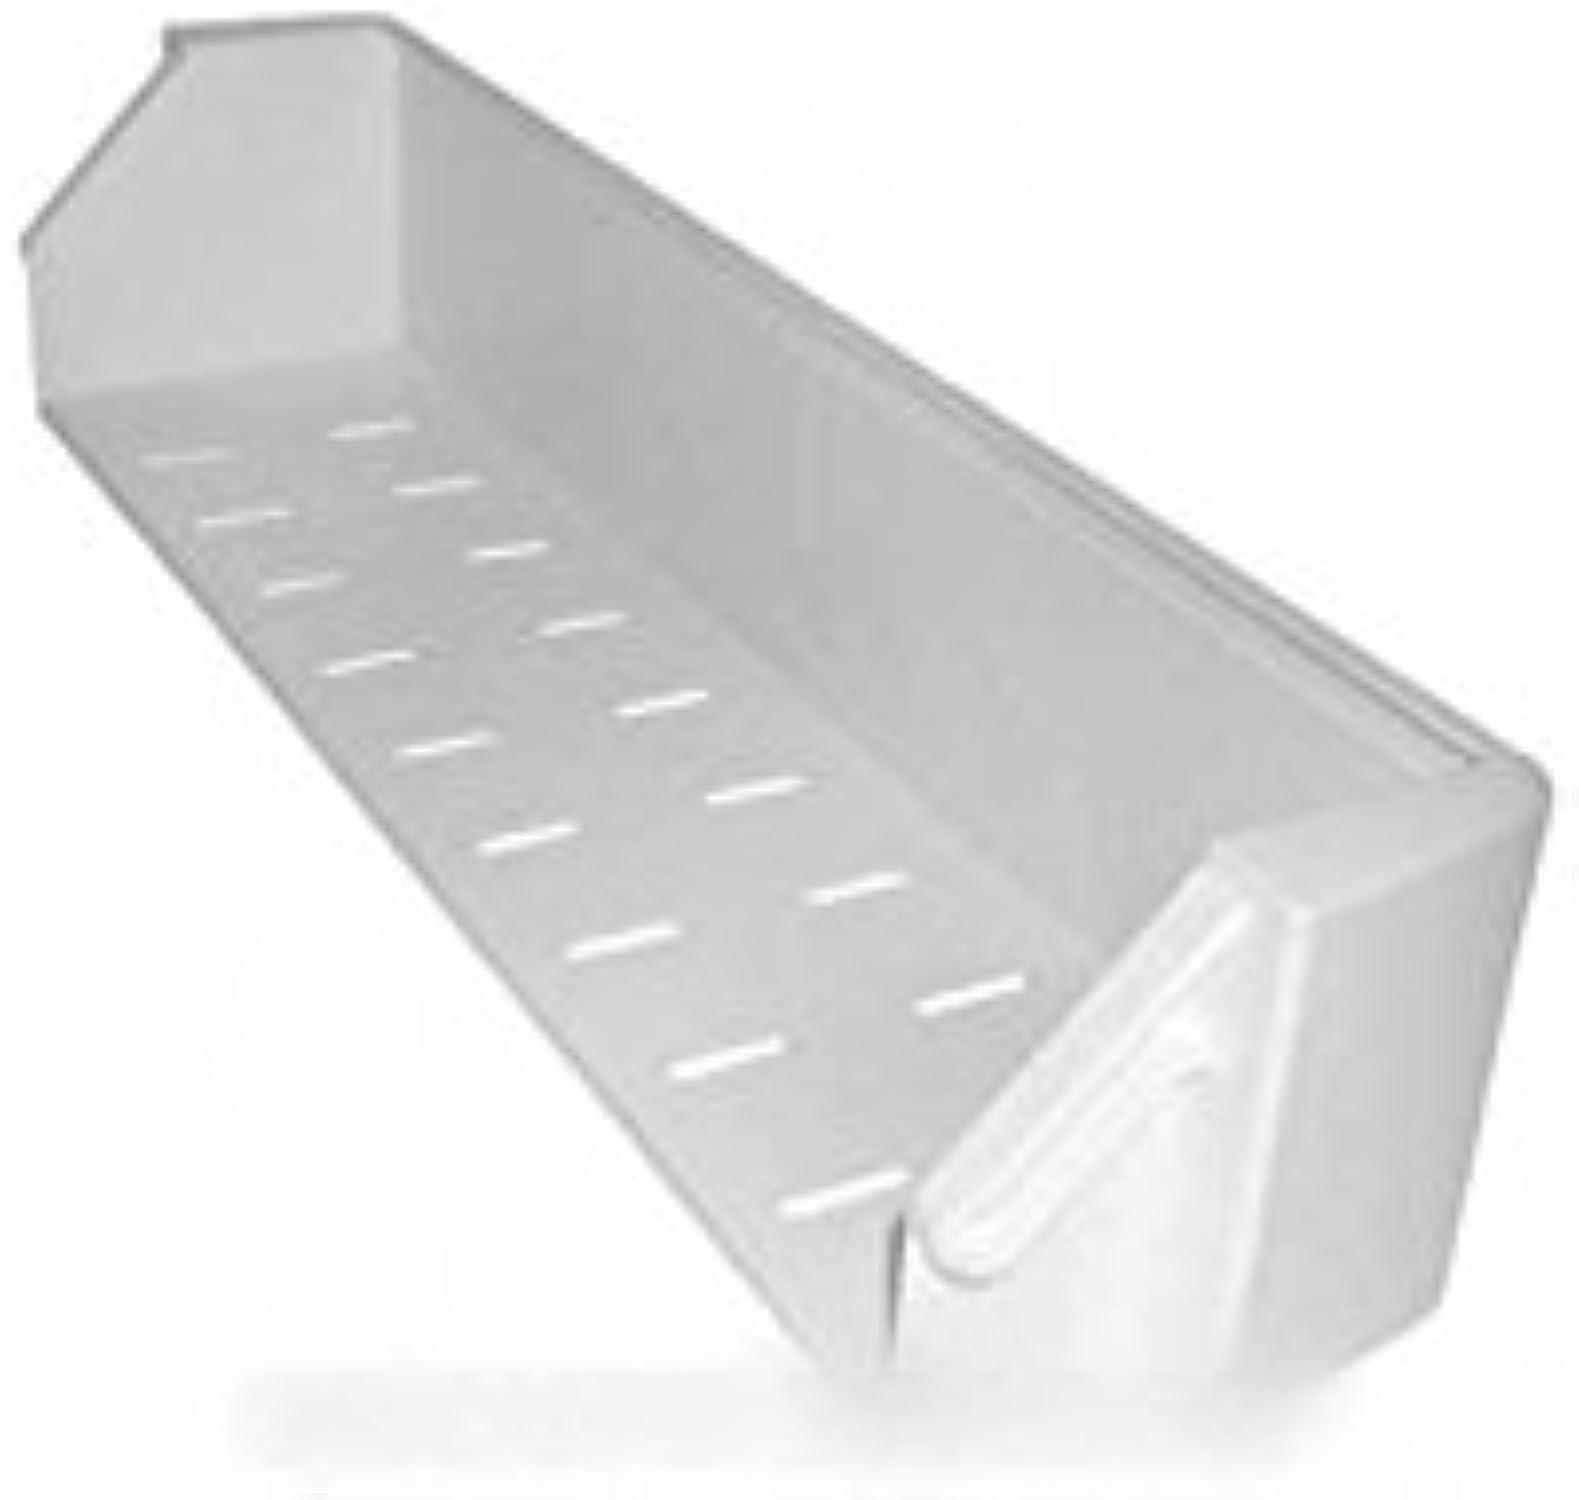 de moda Scholtes–lácteos botellas l46,5cm–L l46,5cm–L l46,5cm–L 10,4cm–H9,5cm para frigorífico vogica  diseño único